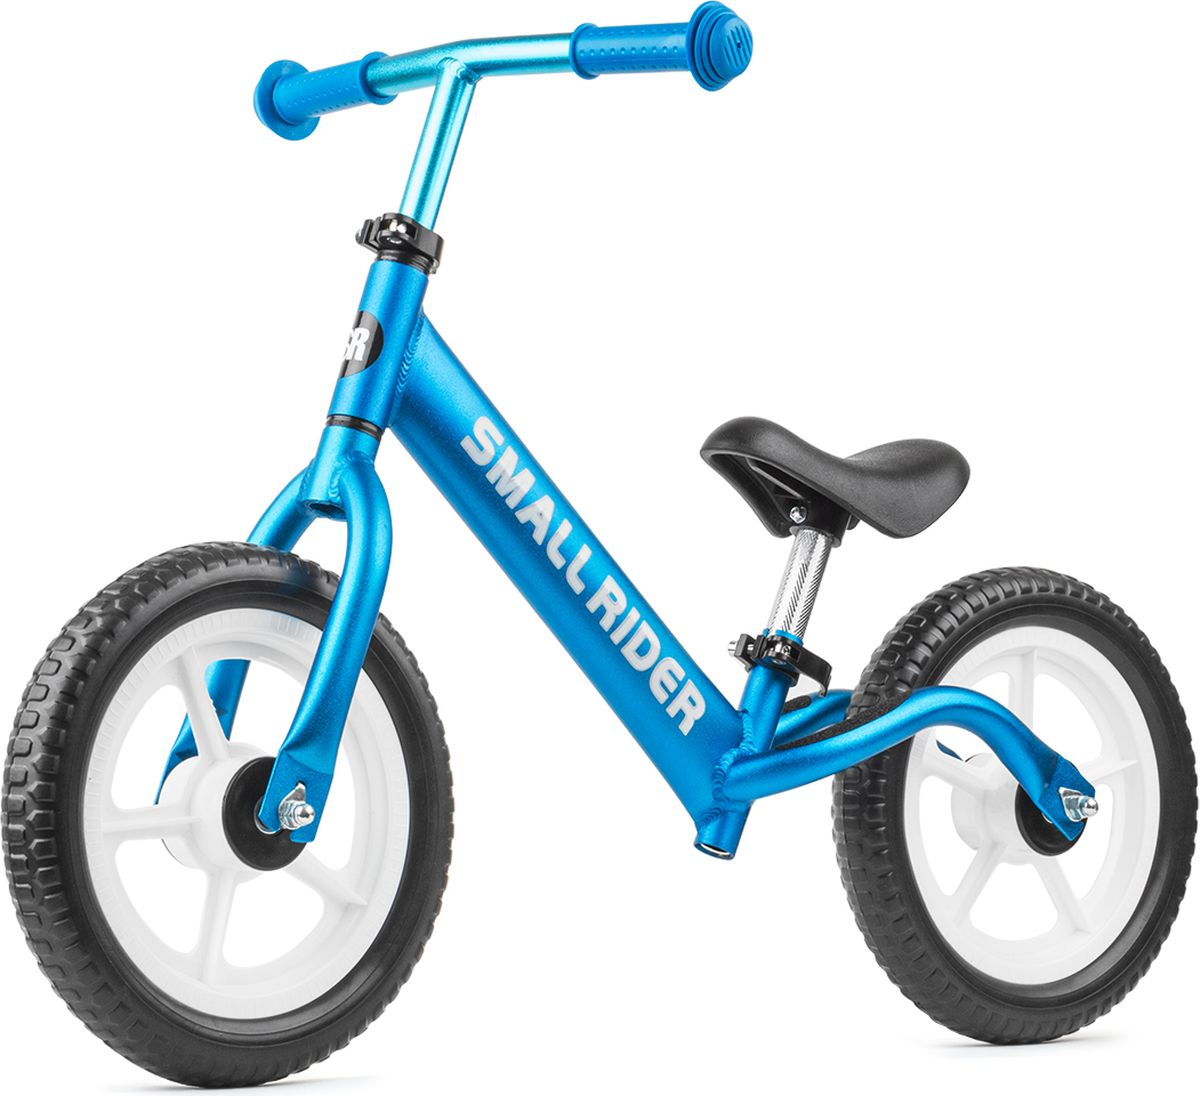 Small Rider Беговел детский Foot Racer Light цвет голубой беговел rt racer rz 1 red ор501в3